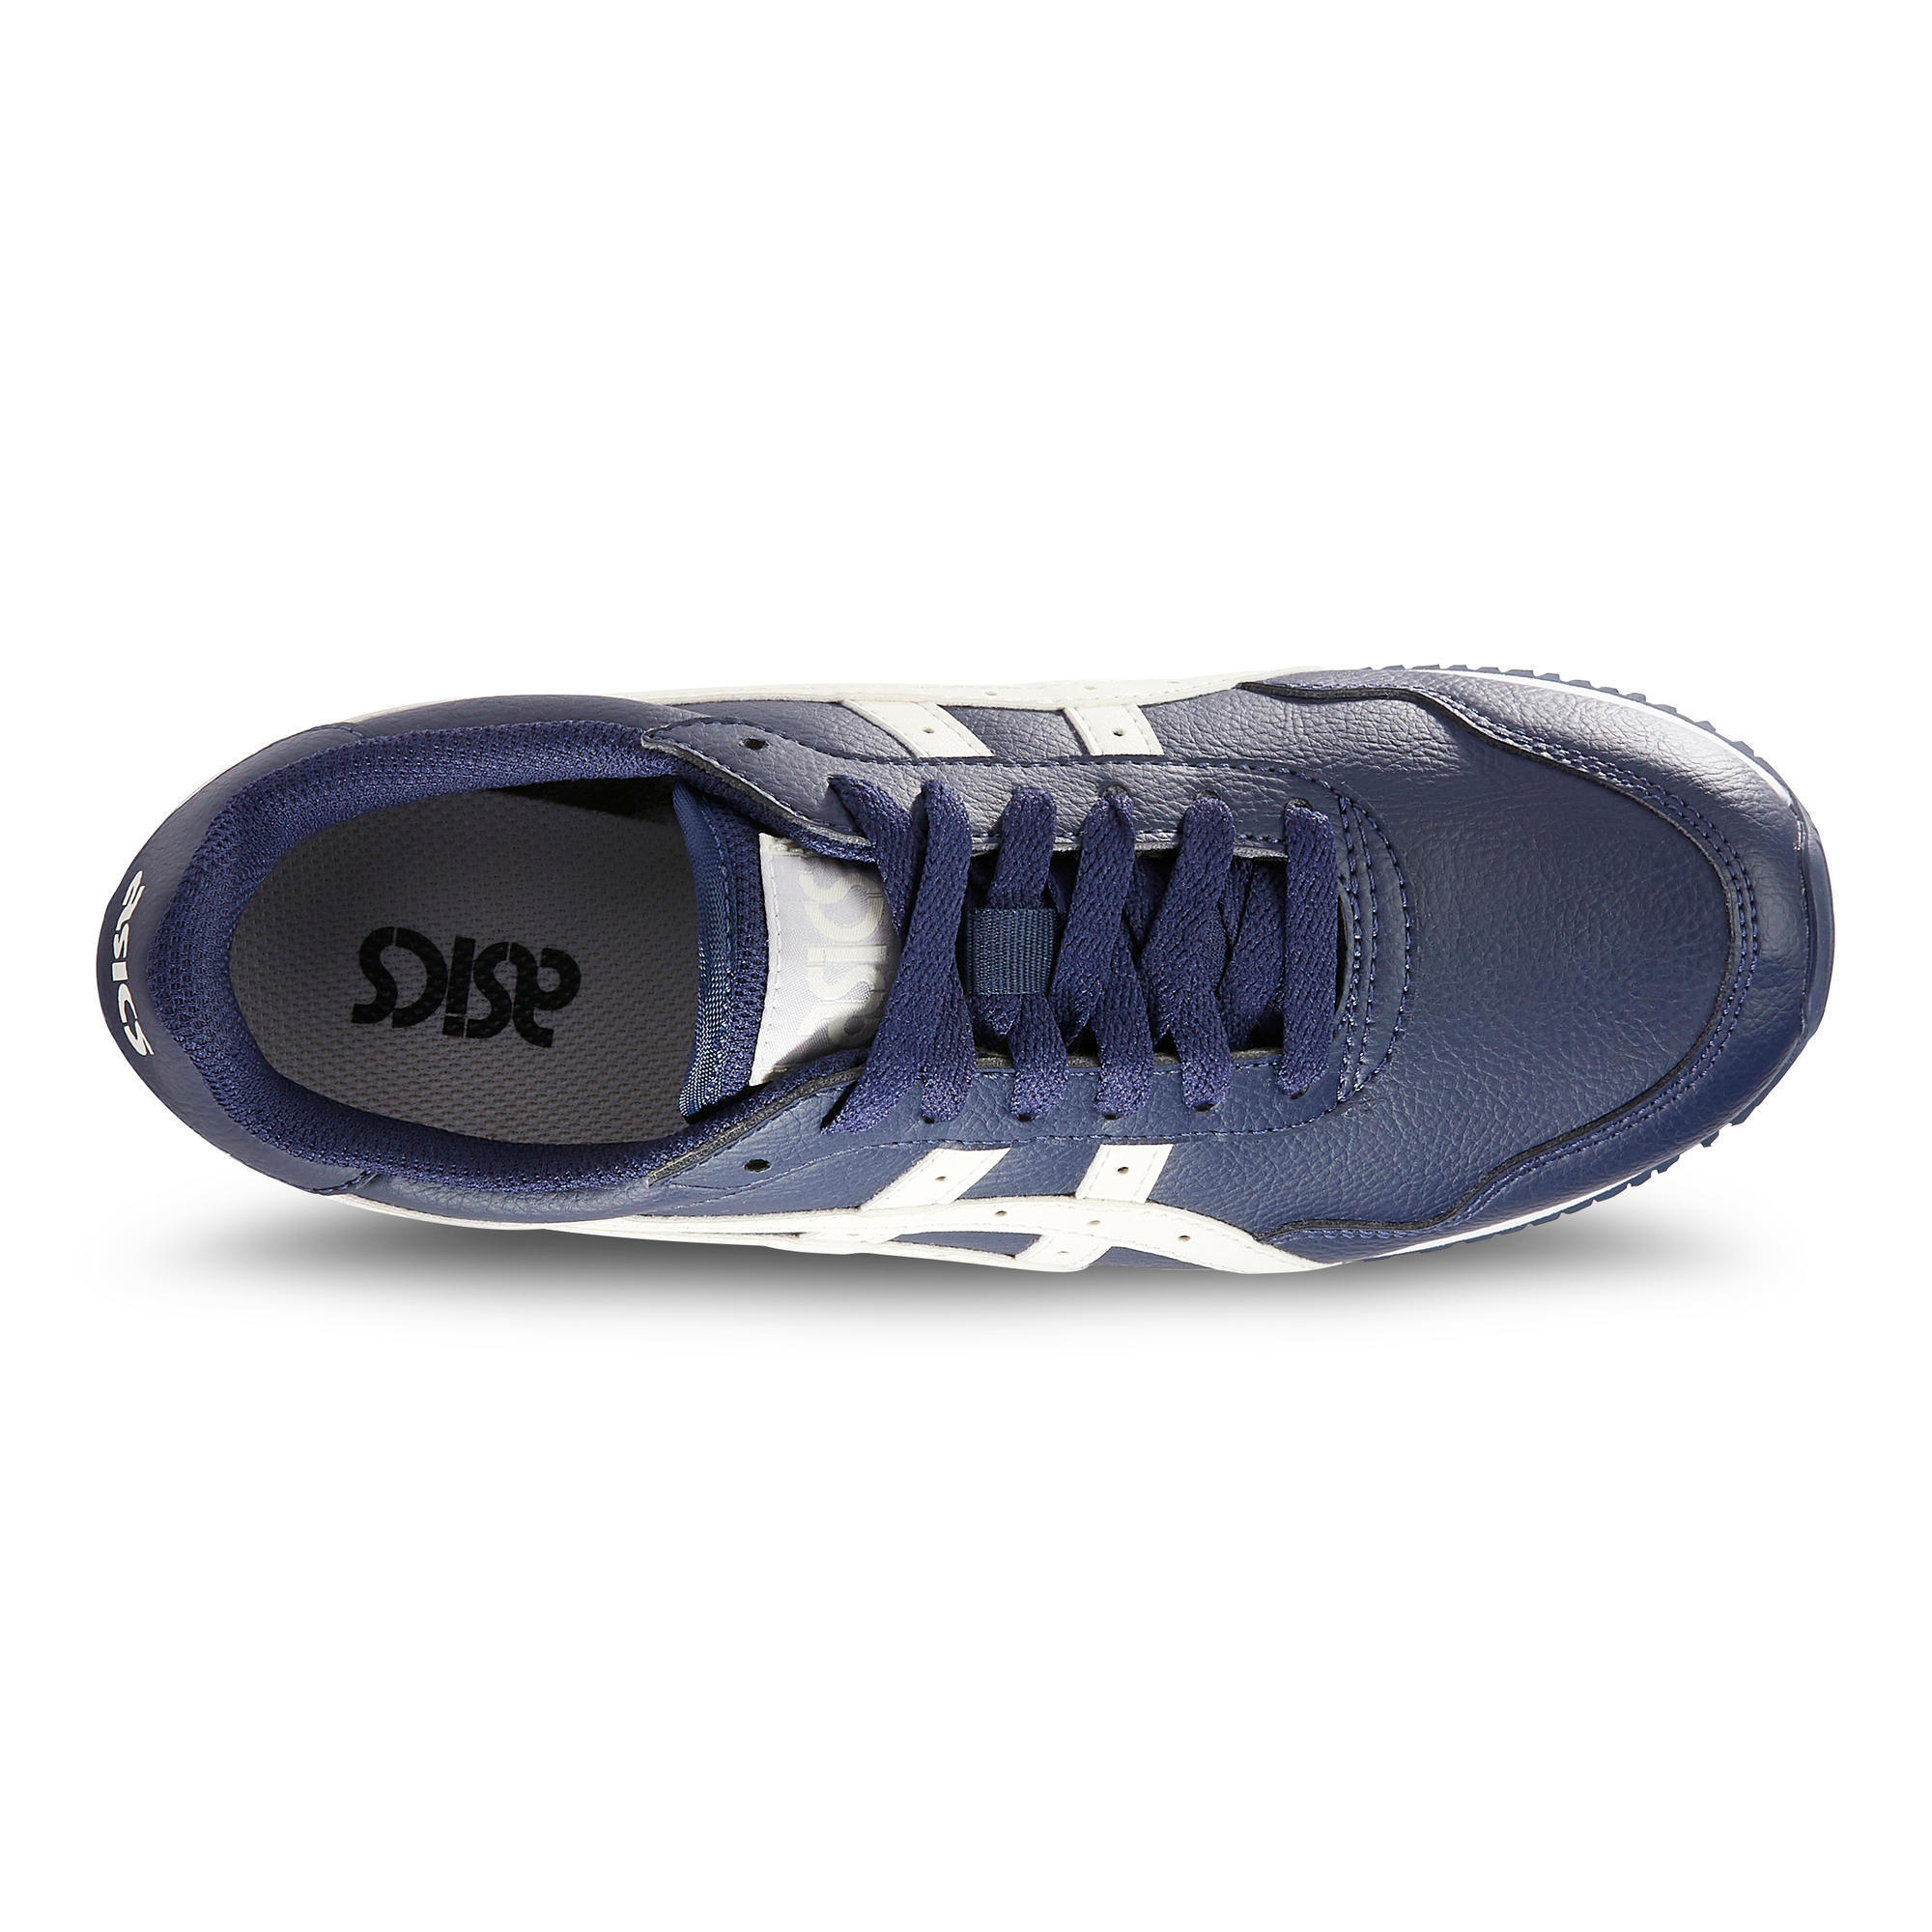 Chaussures marche active femme Asics Tiger marine ASICS | Decathlon